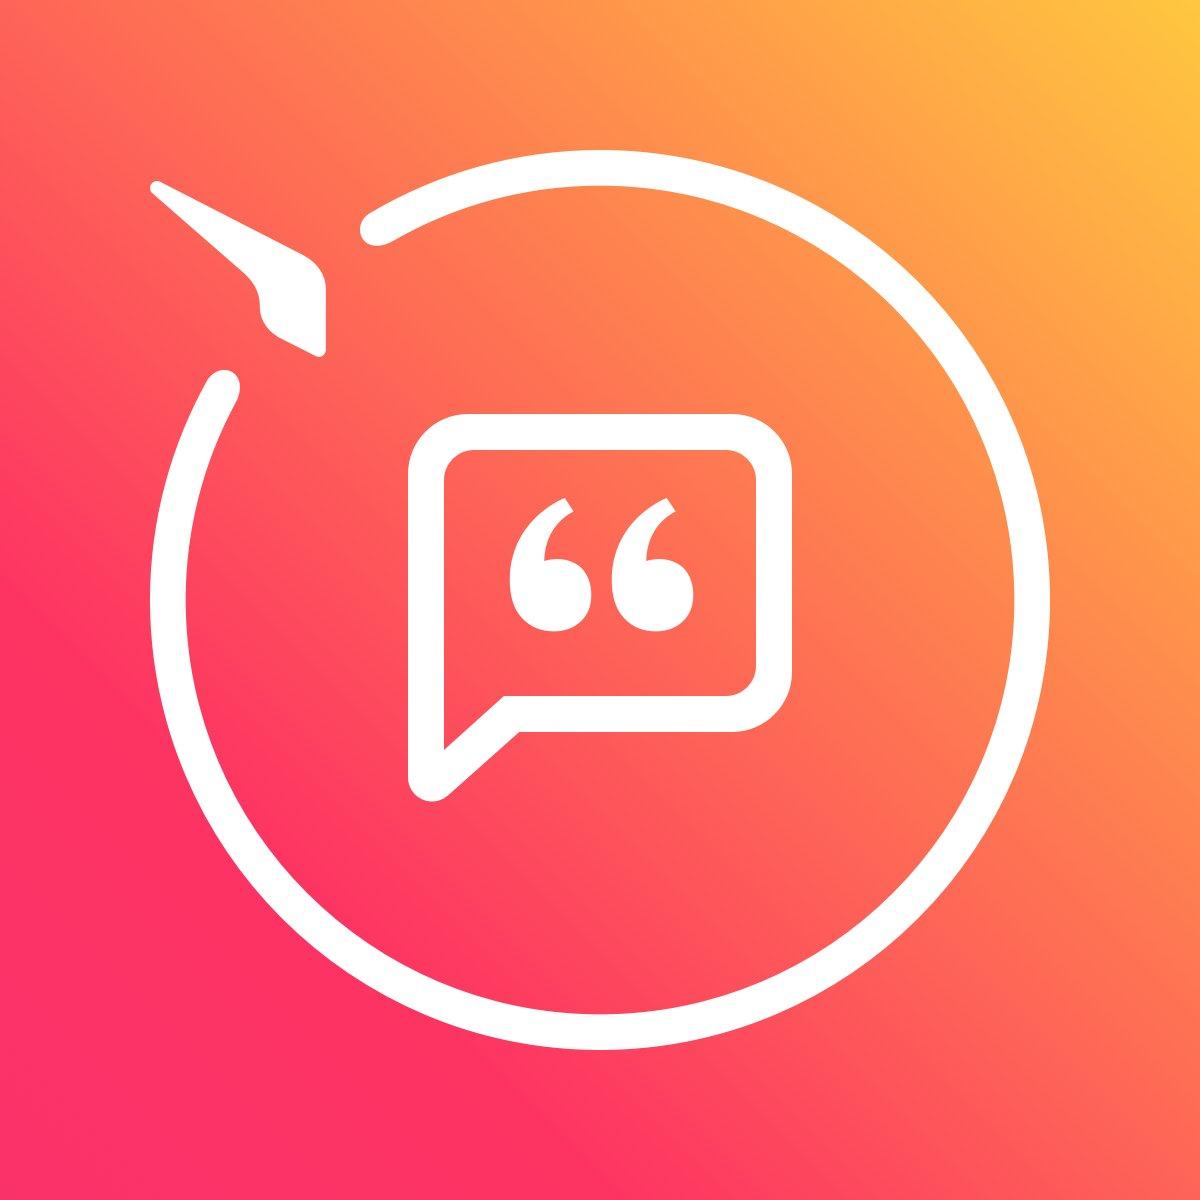 Shopify Testimonials app by Elfsight